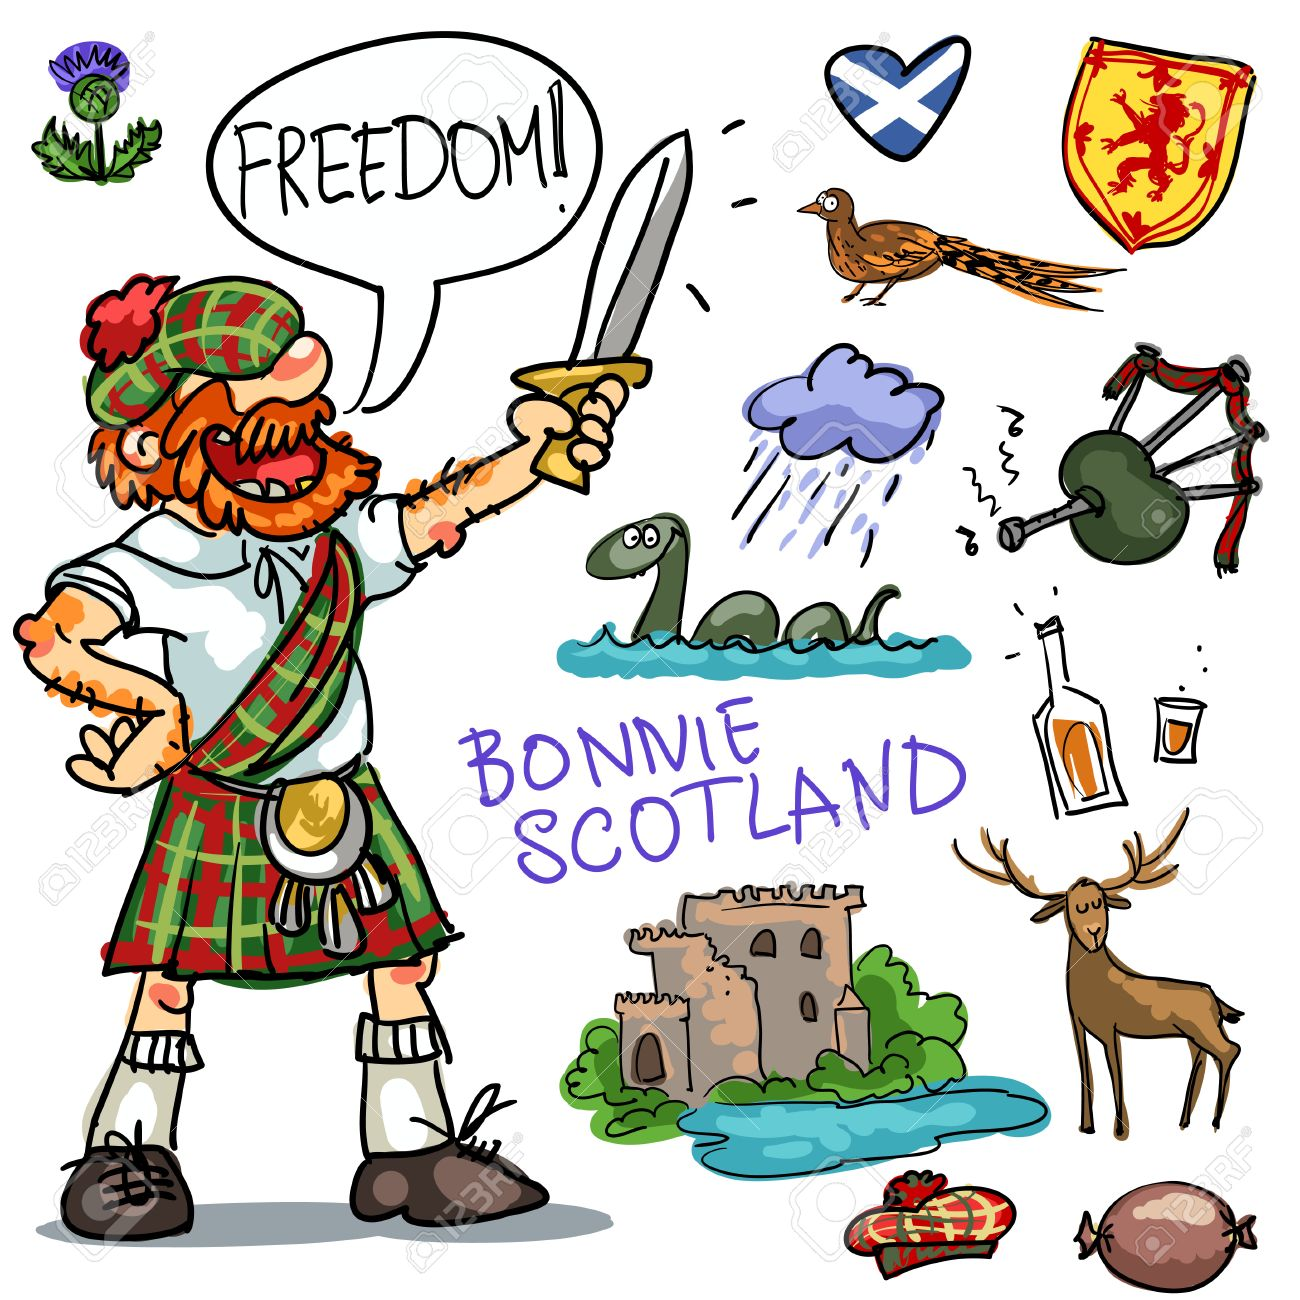 1300x1300 Bonnie Scotland Cartoon Collection, Funny Scottish Man With Sword